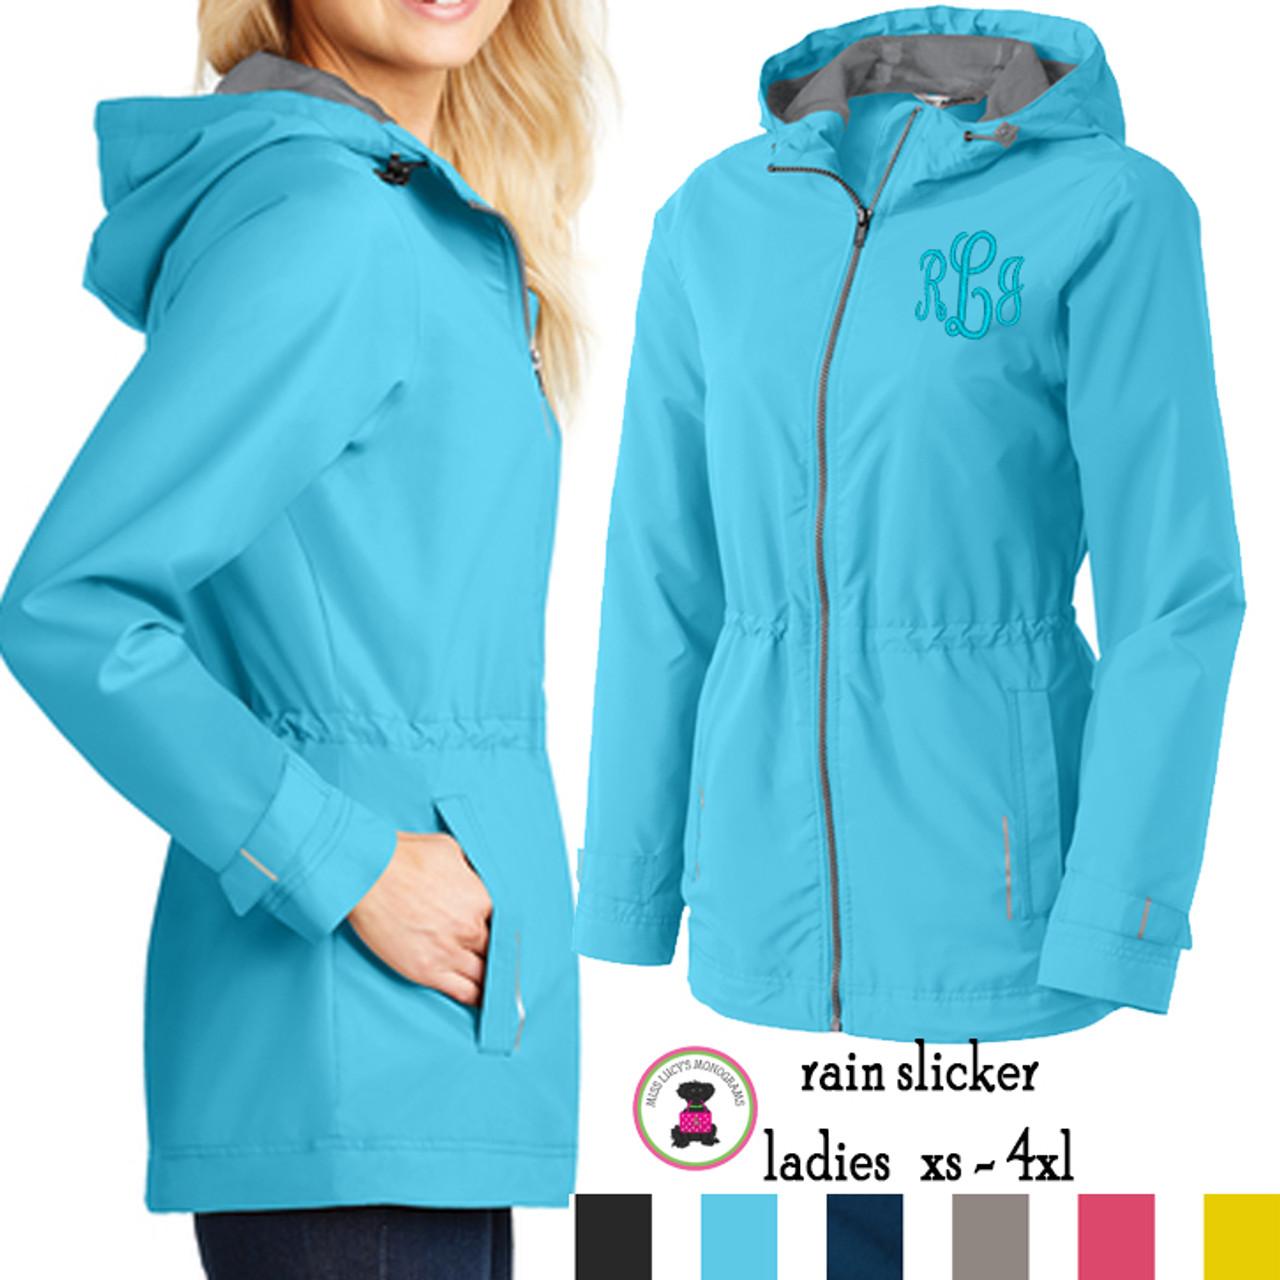 3XL 2XL 4XL NEW Mens Waterproof Rain Jacket Coat Slicker Hood Pockets S-XL